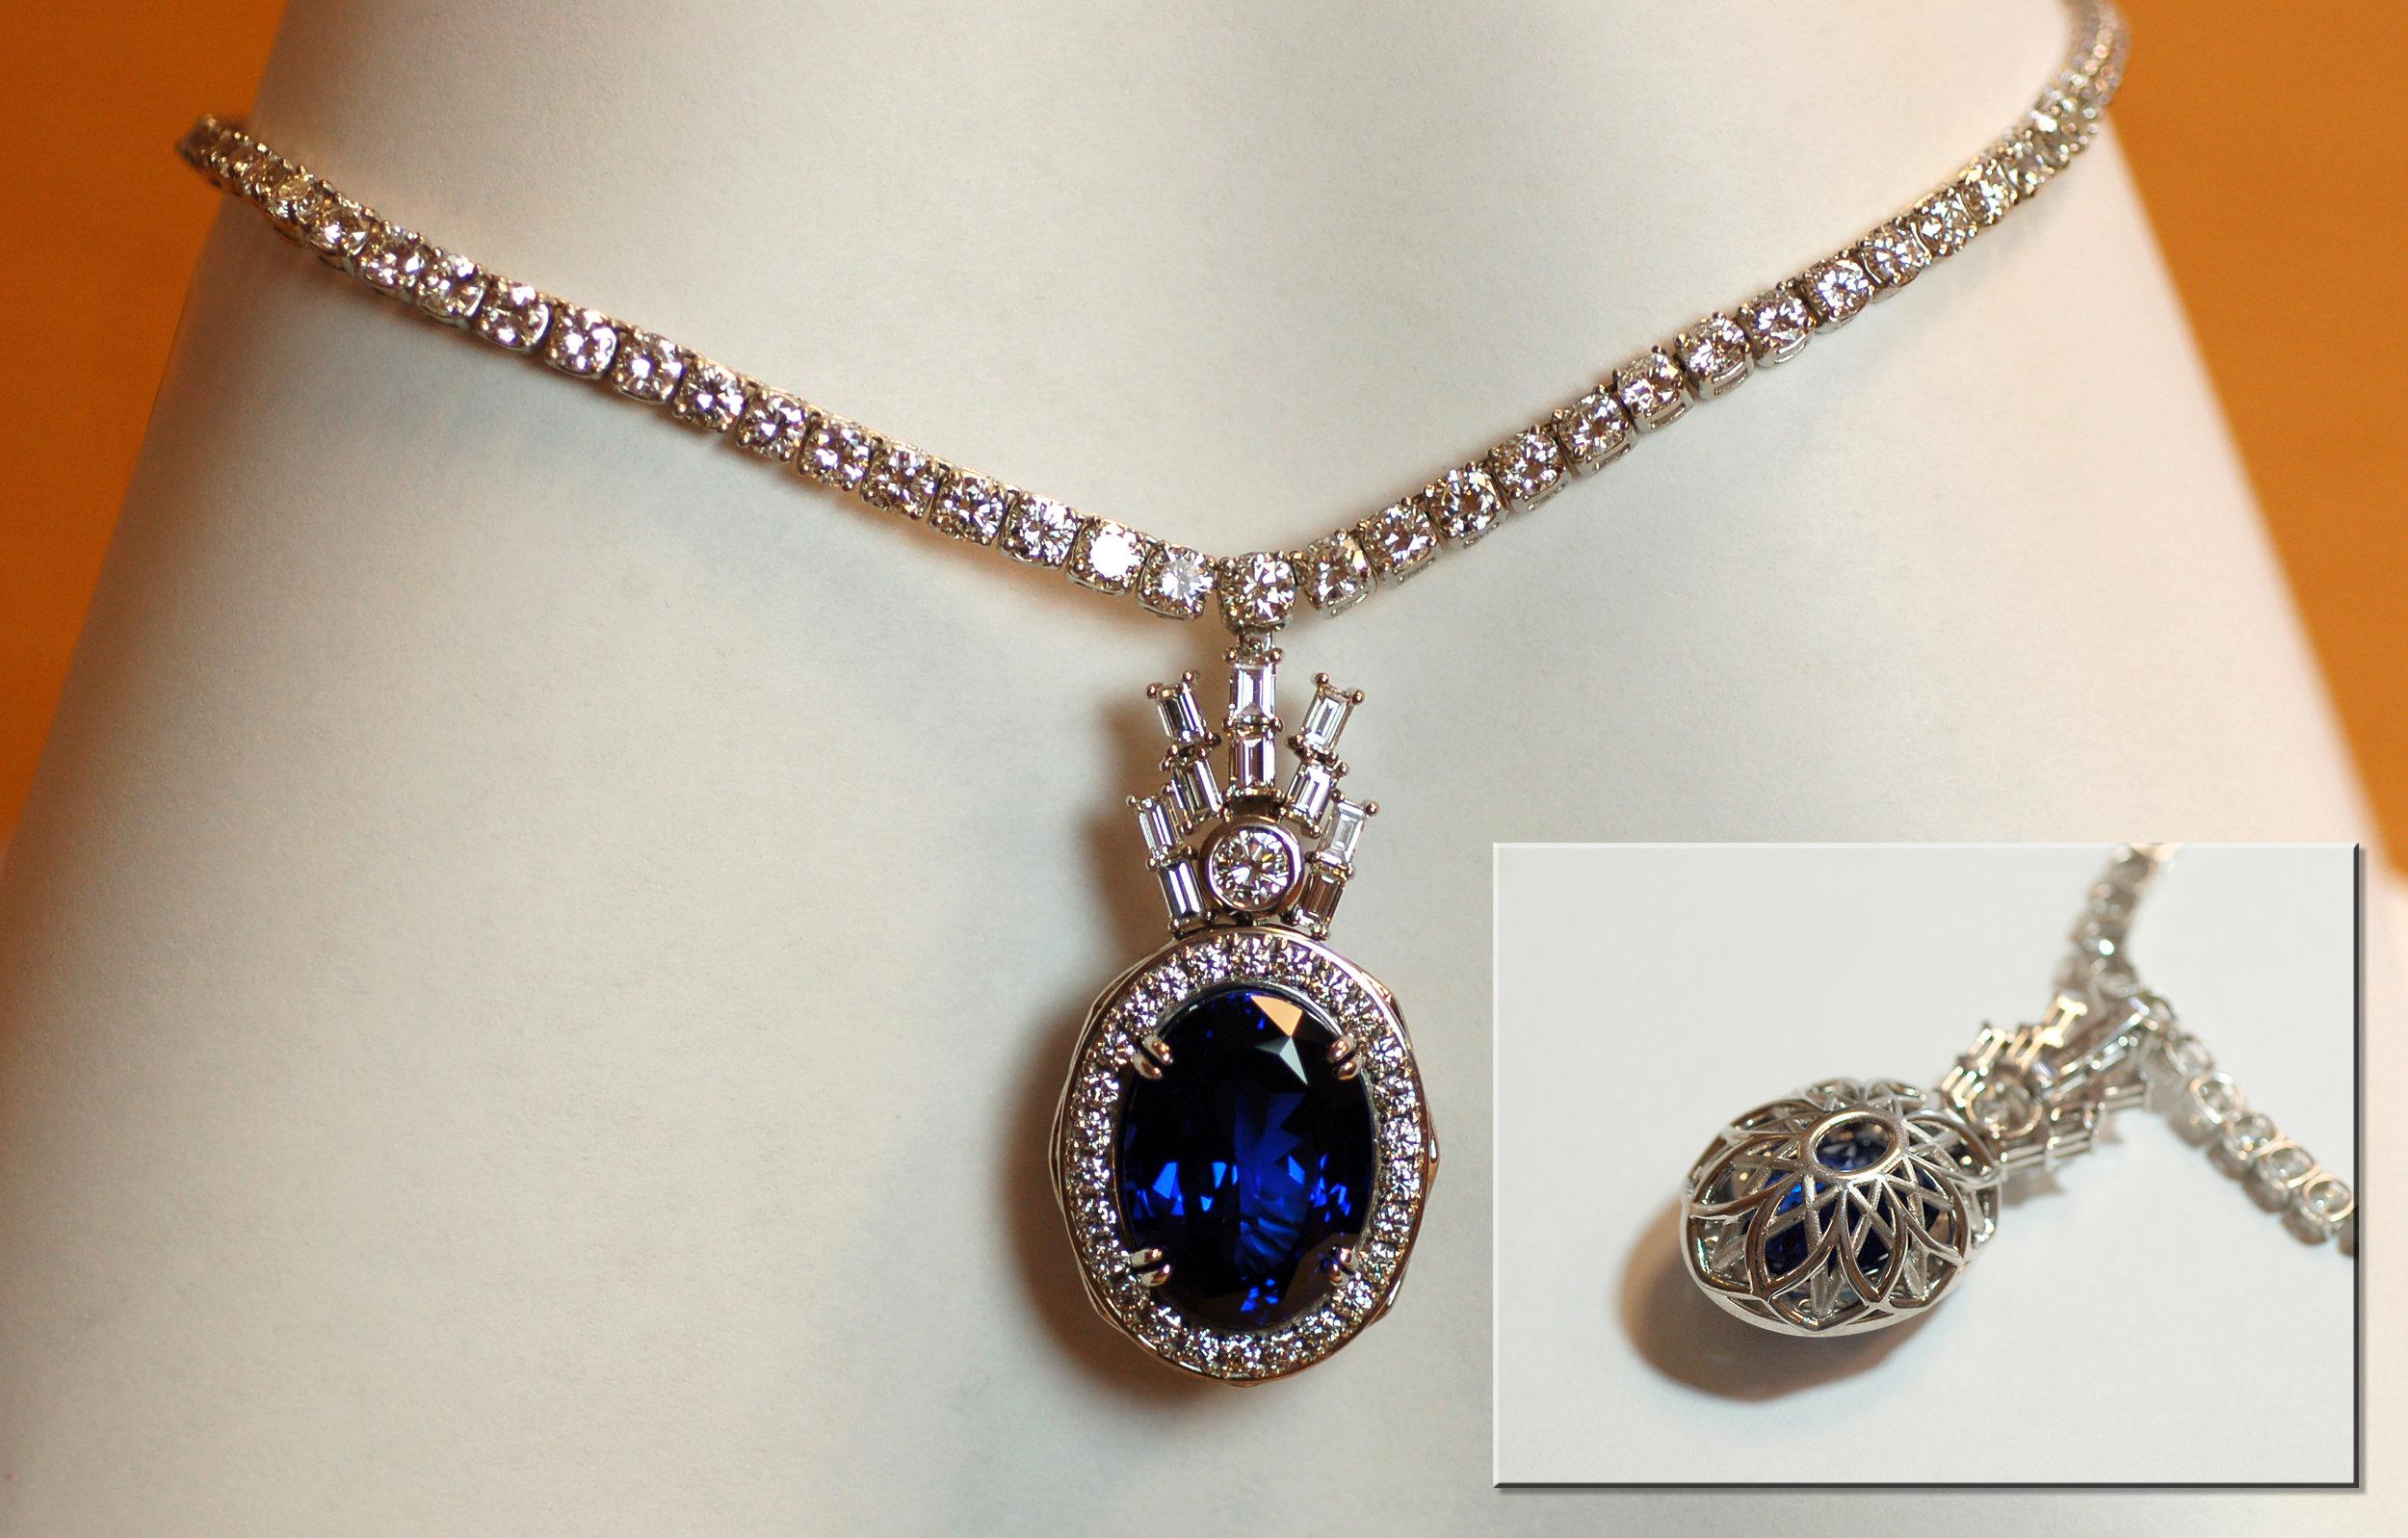 Large oval Tanzanite pendant